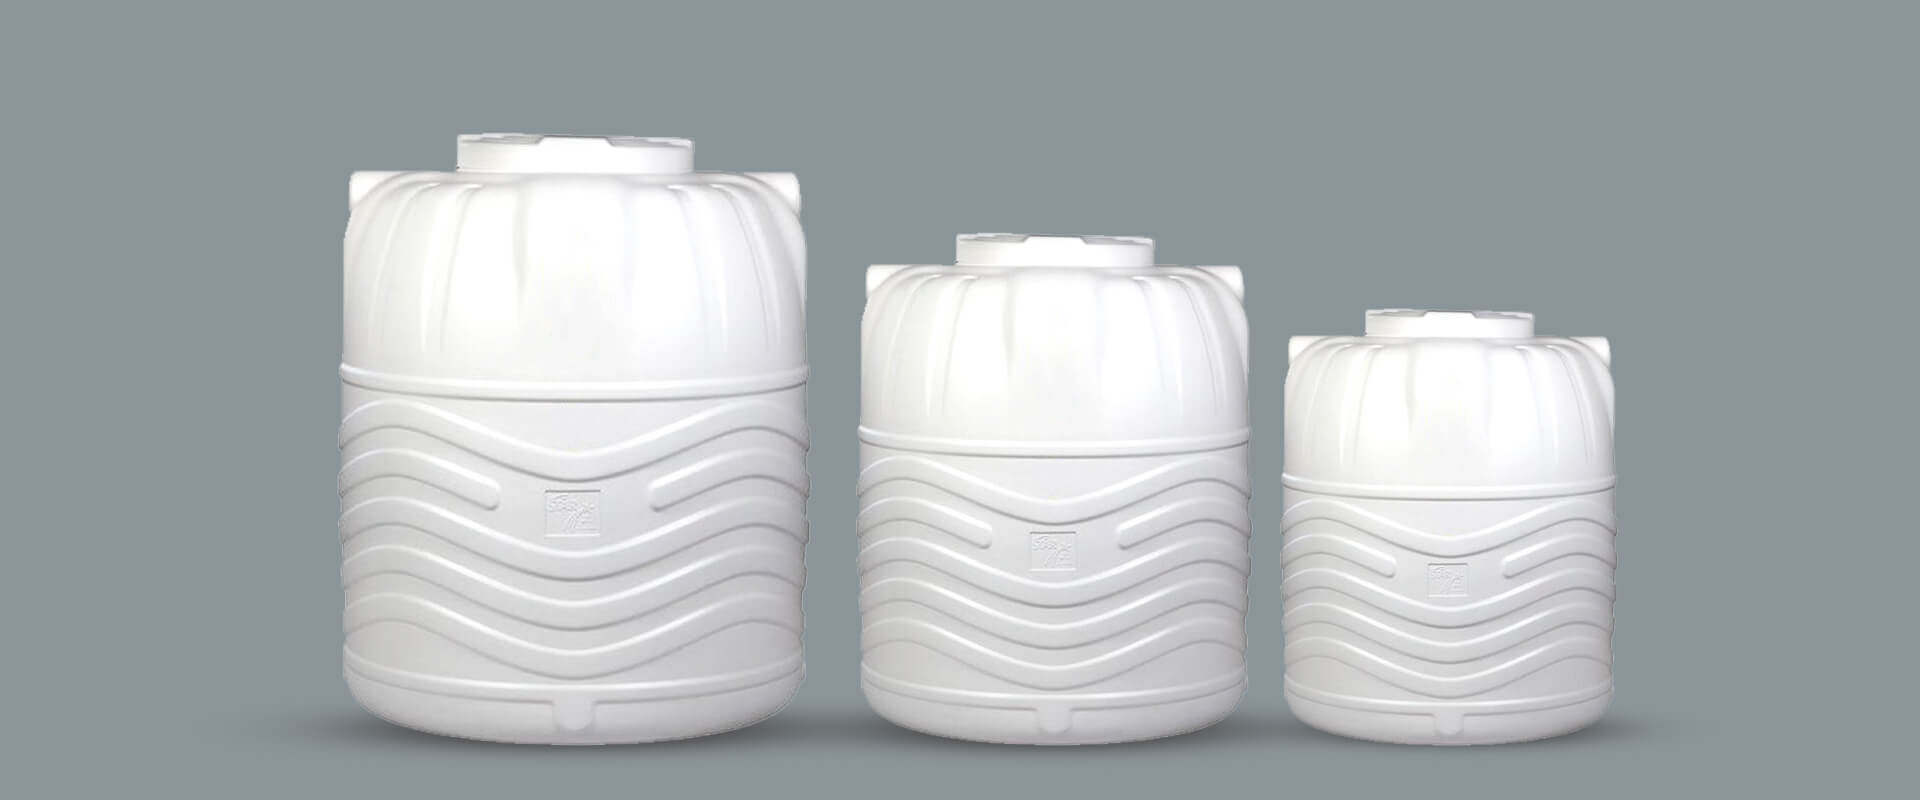 White Roto Moulding Masterbatches Manufacturer